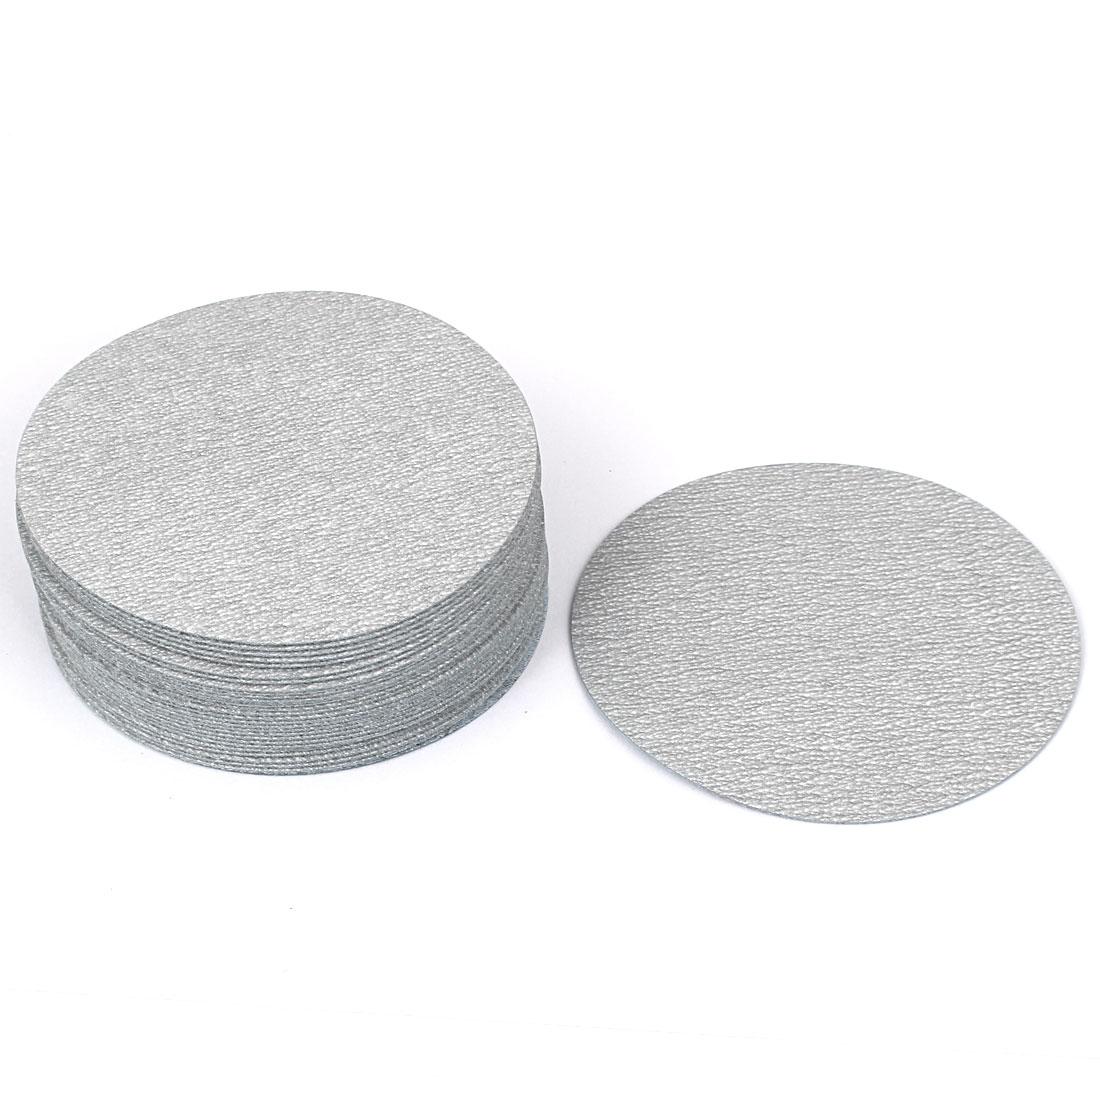 "6"" Dia Grindingg Abrasive Sanding Flocking Sandpaper Sheet Paper Disc 120 Grit 10 Pcs"